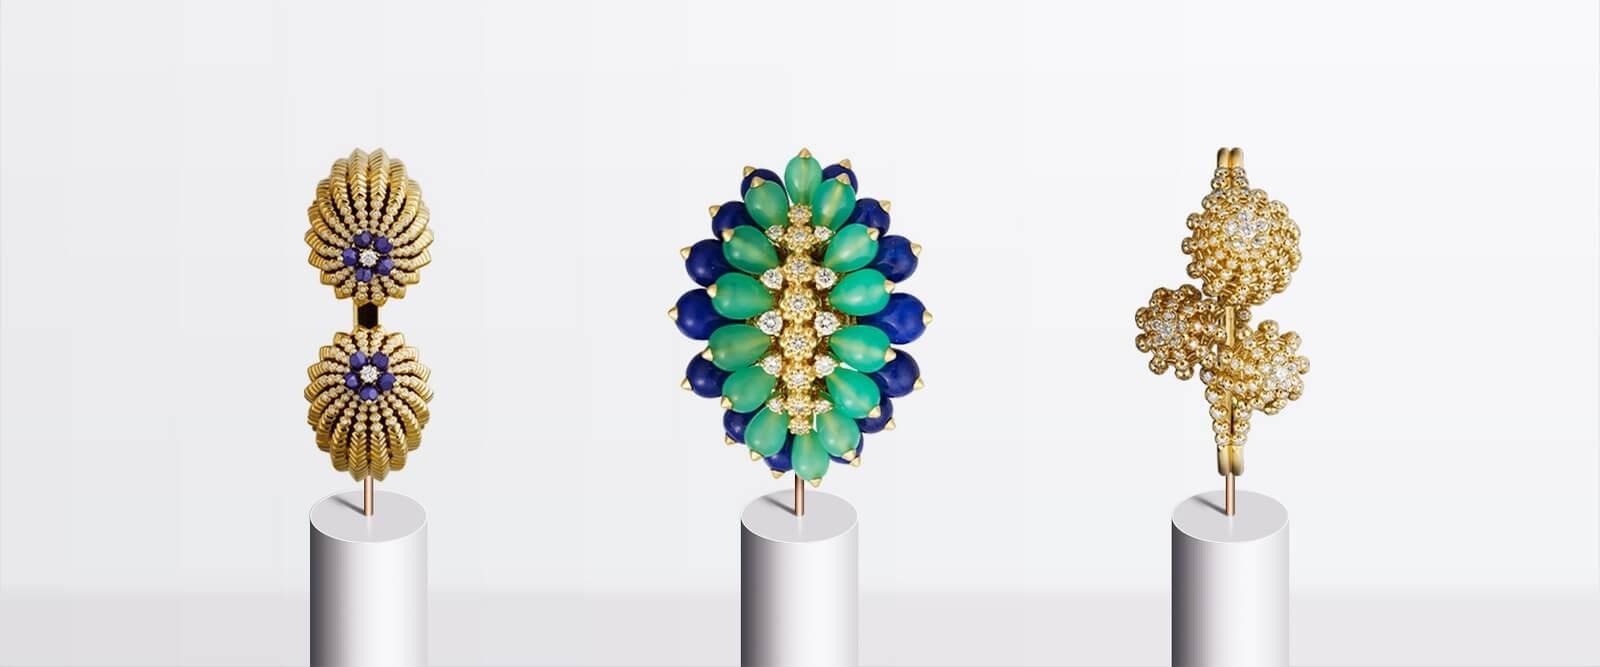 Браслеты Cactus de Cartier